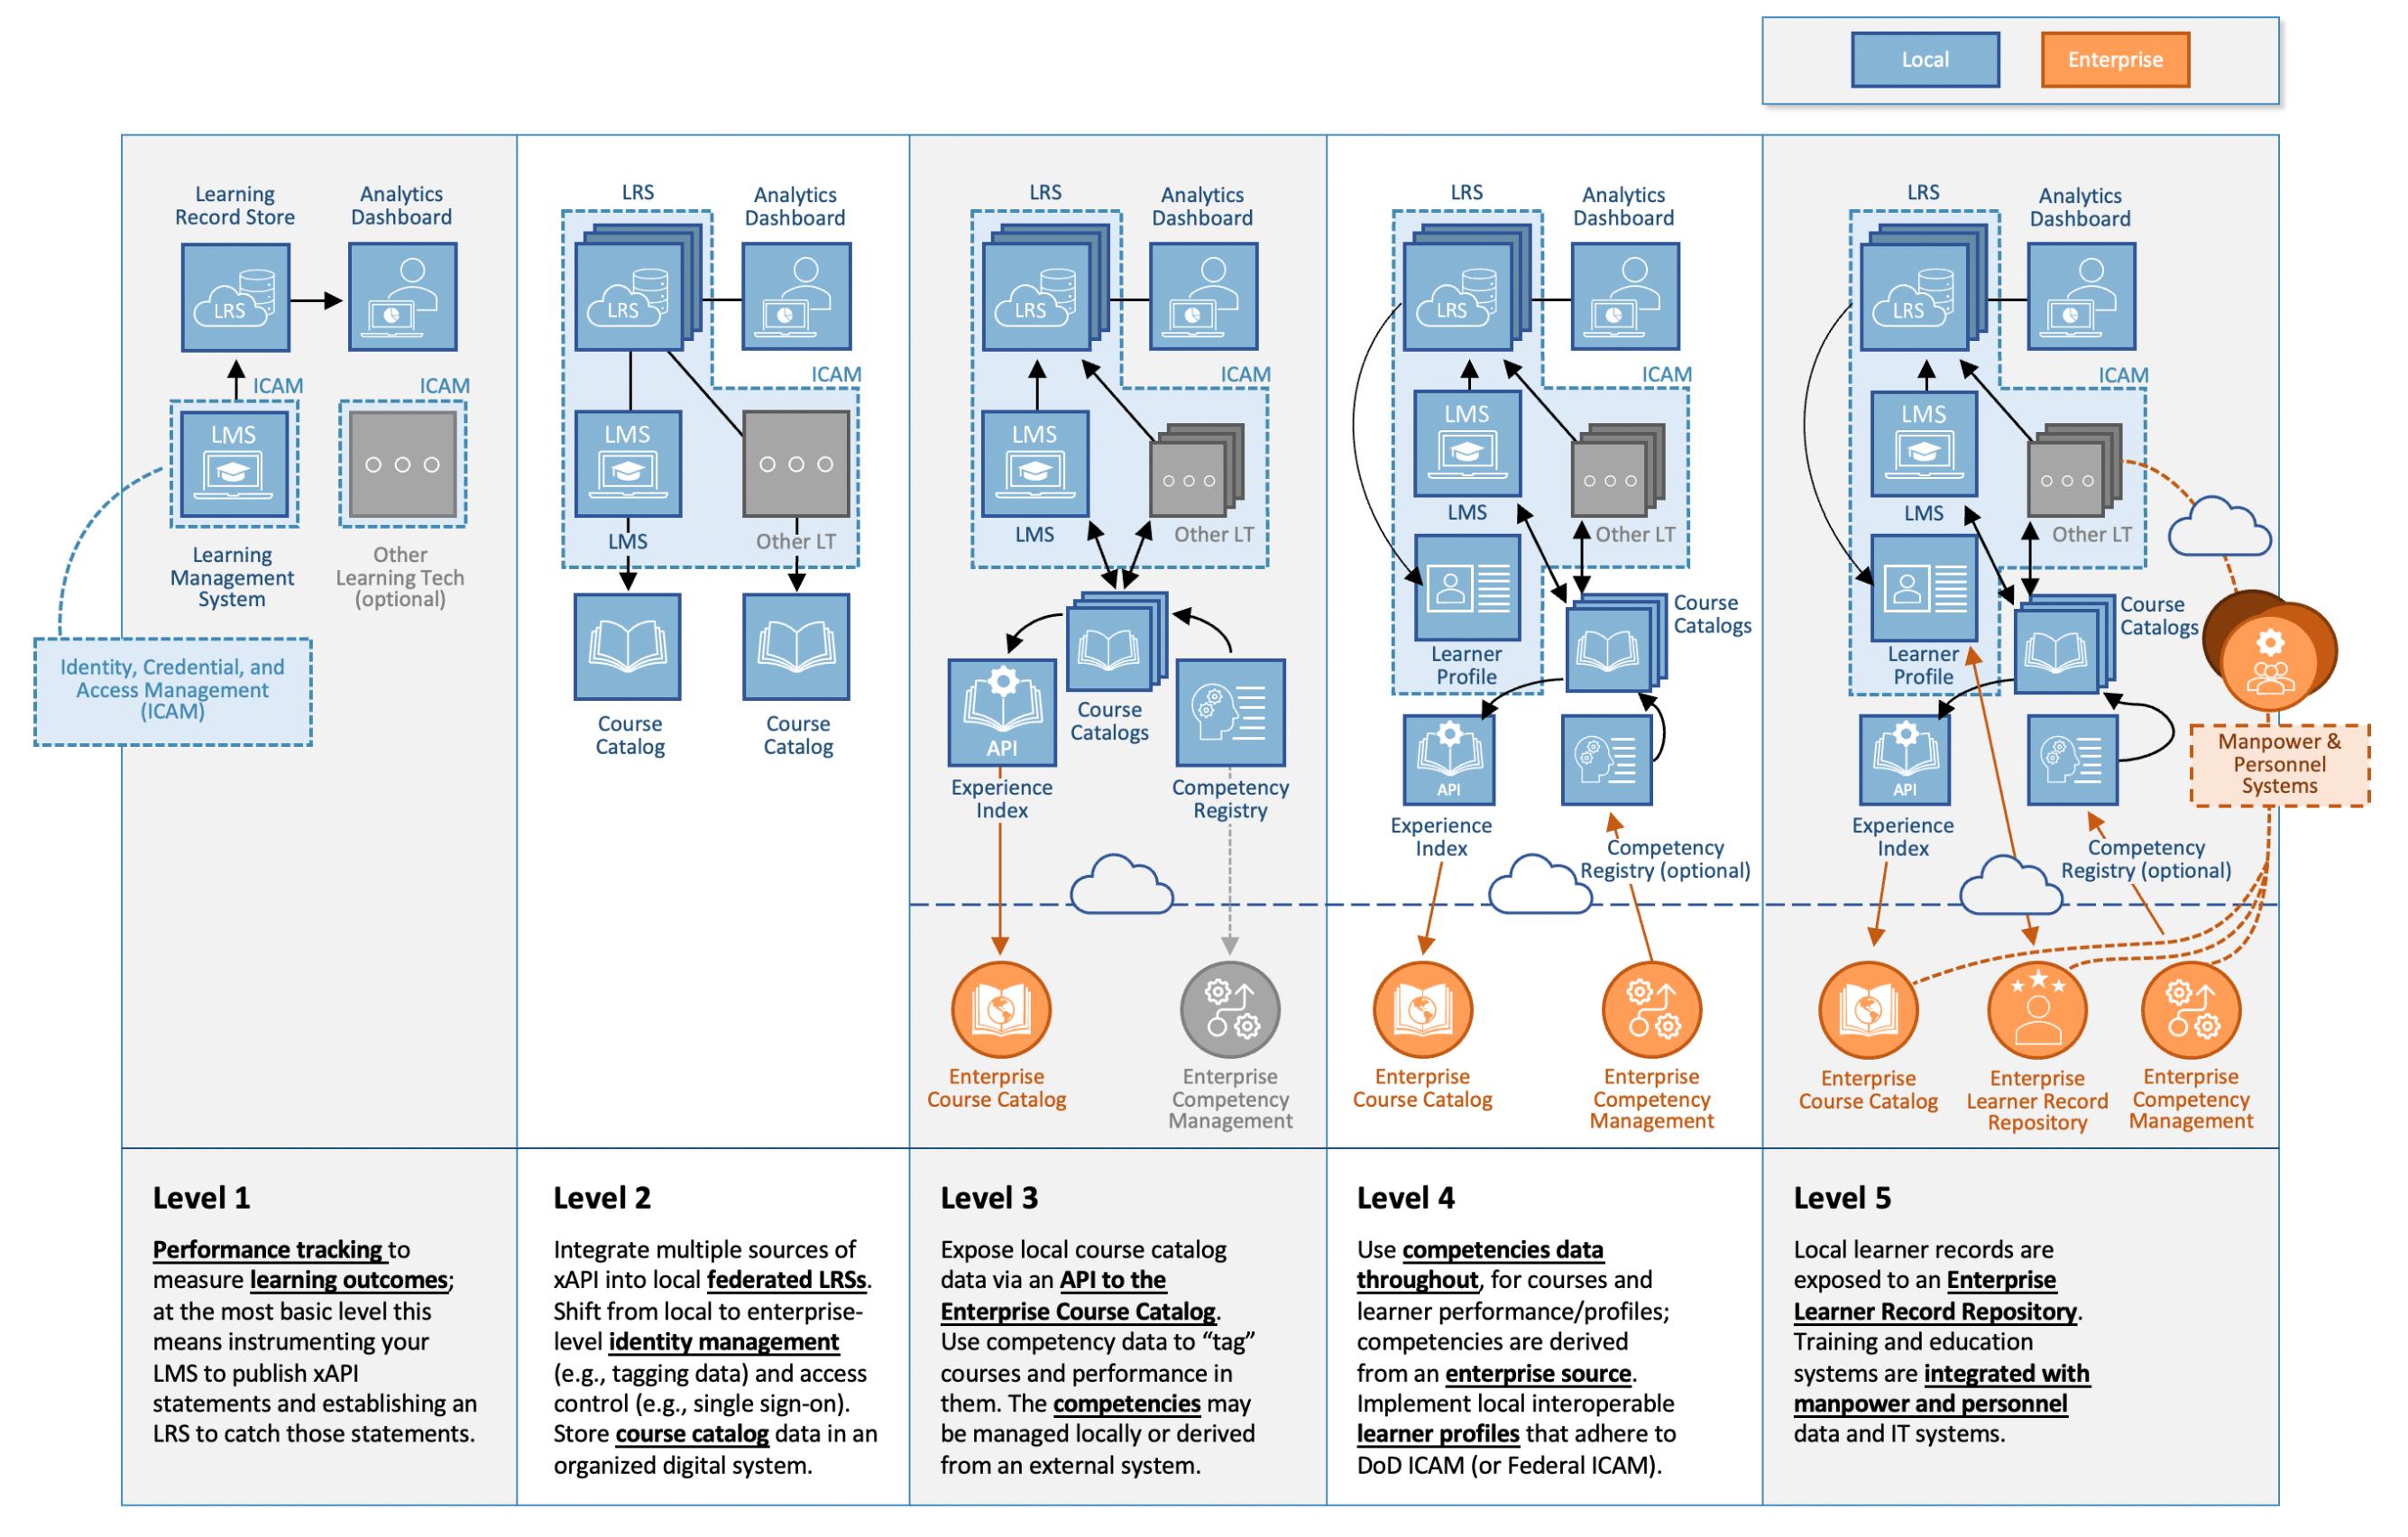 The TLA Capability Maturity Model shows 5 levels of progress.